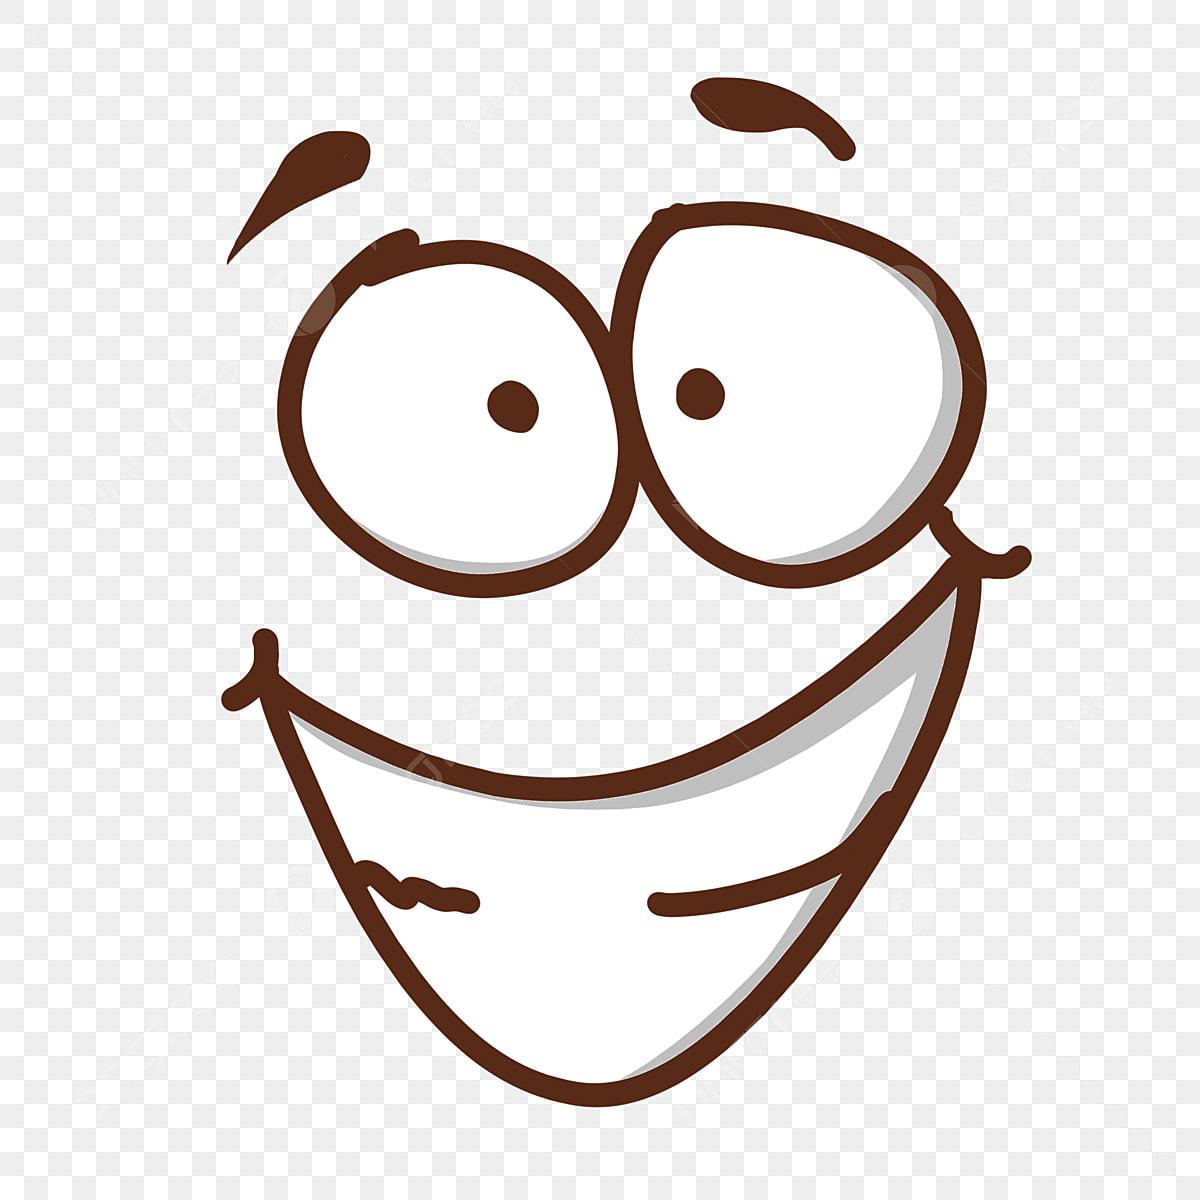 Big Eye Smile Cartoon Illustration, Smile Clipart, Smiling Cartoon ...